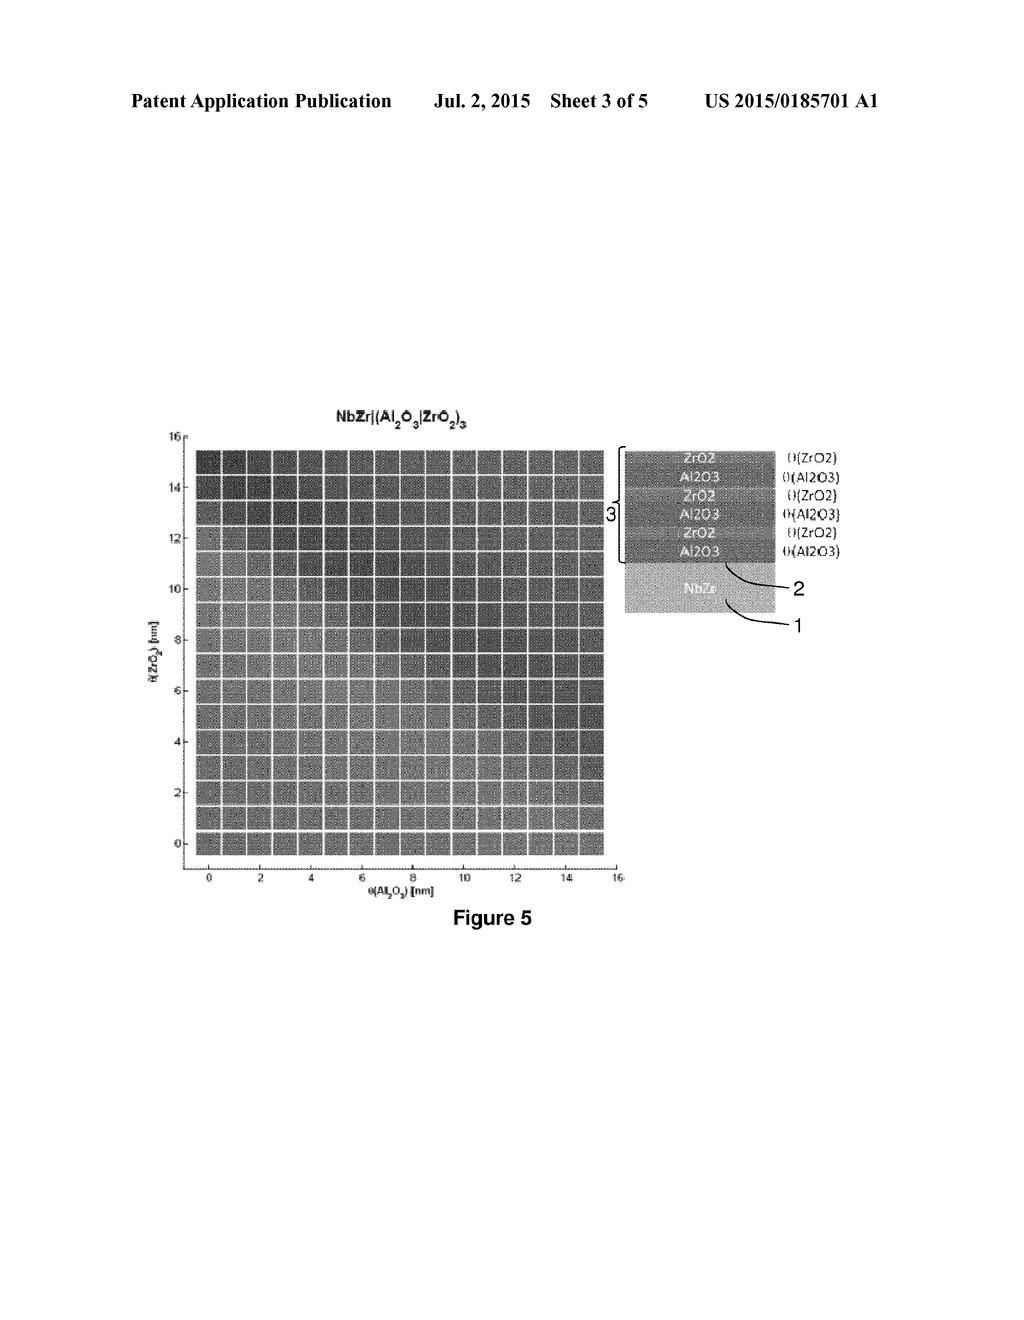 rolex-patent-10.jpg